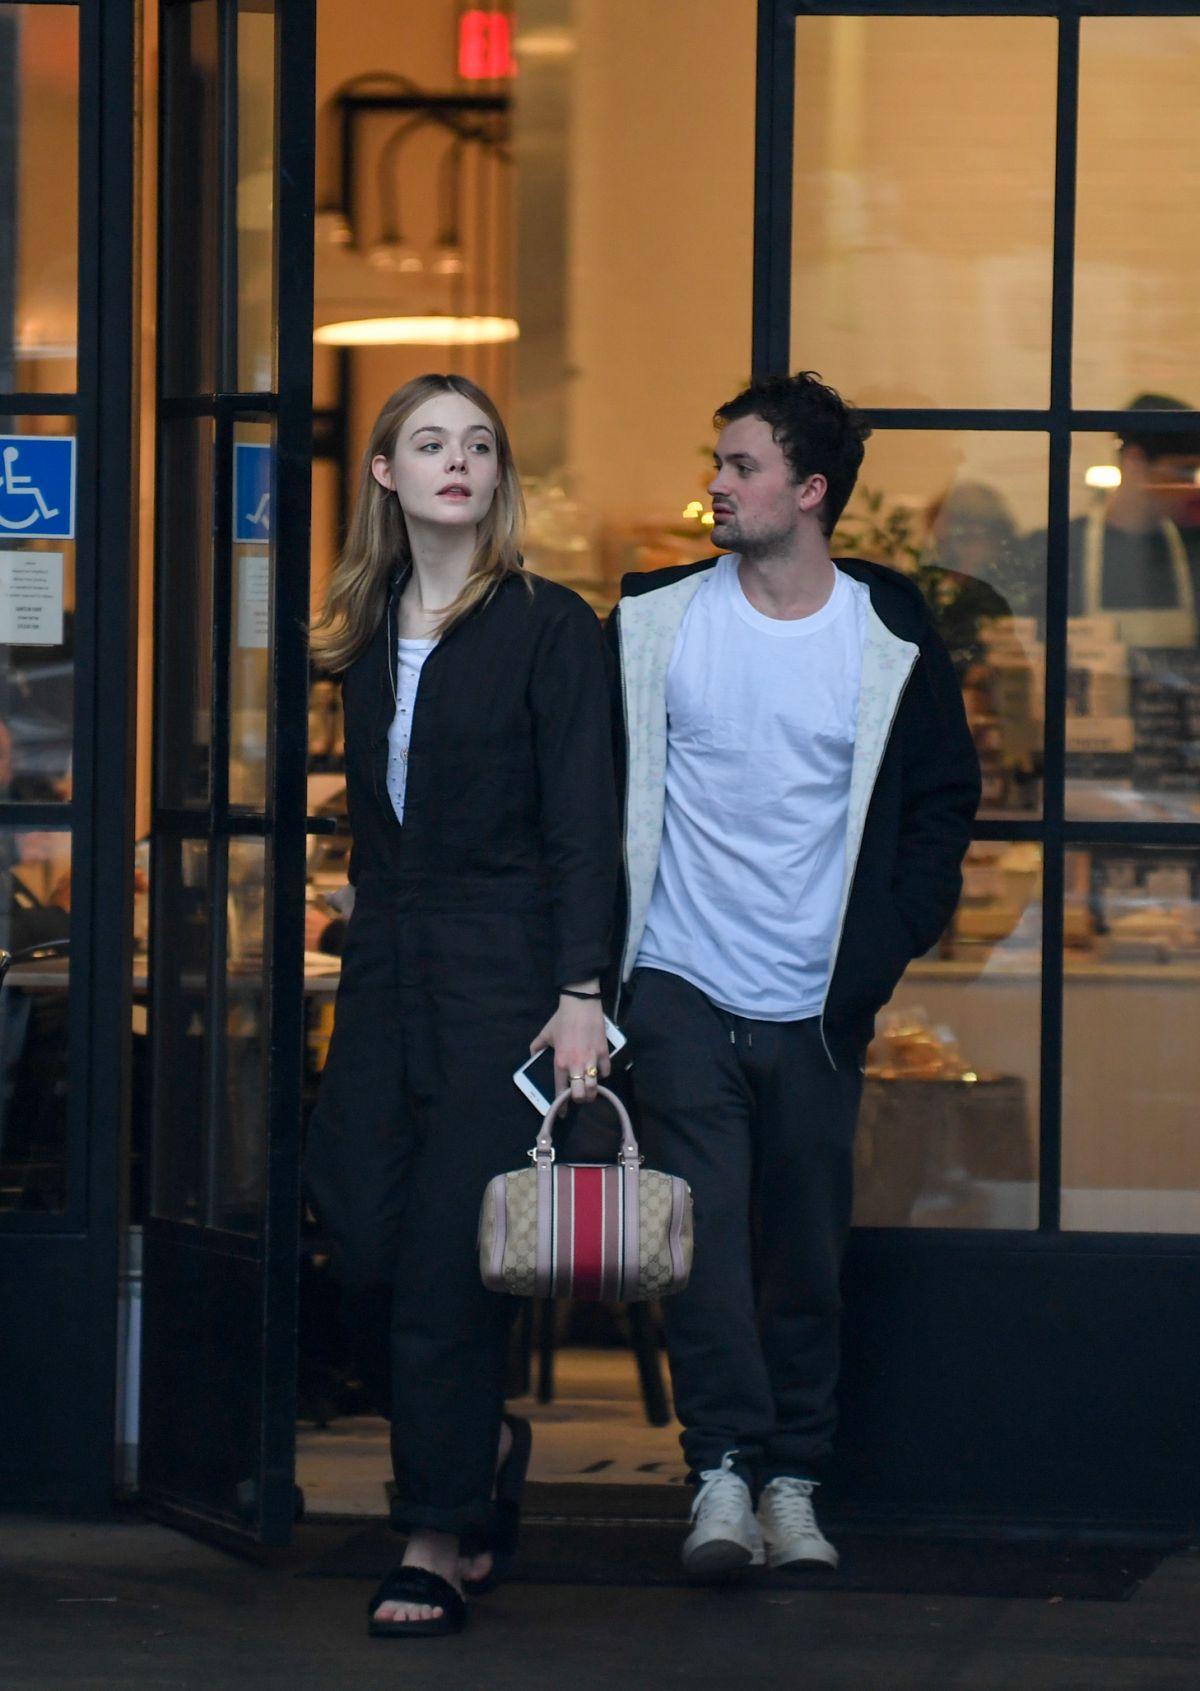 Bethany Joy Lenz Boyfriend Awesome elle fanning and boyfriend dylan beck out in studio city 12/31